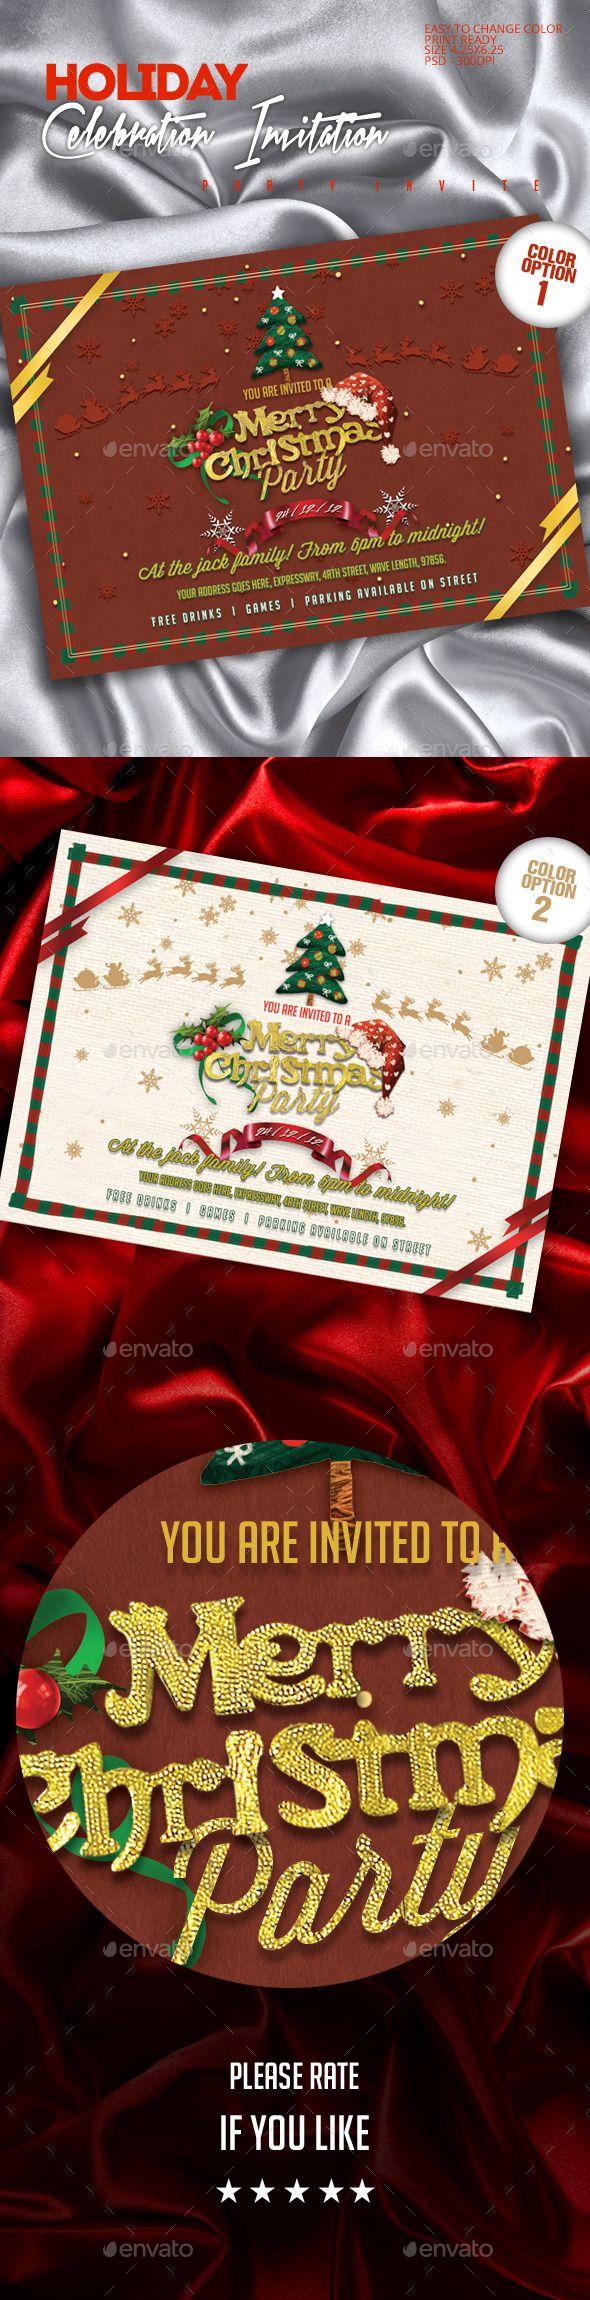 Luxury Retro Christmas Party Invitations Image